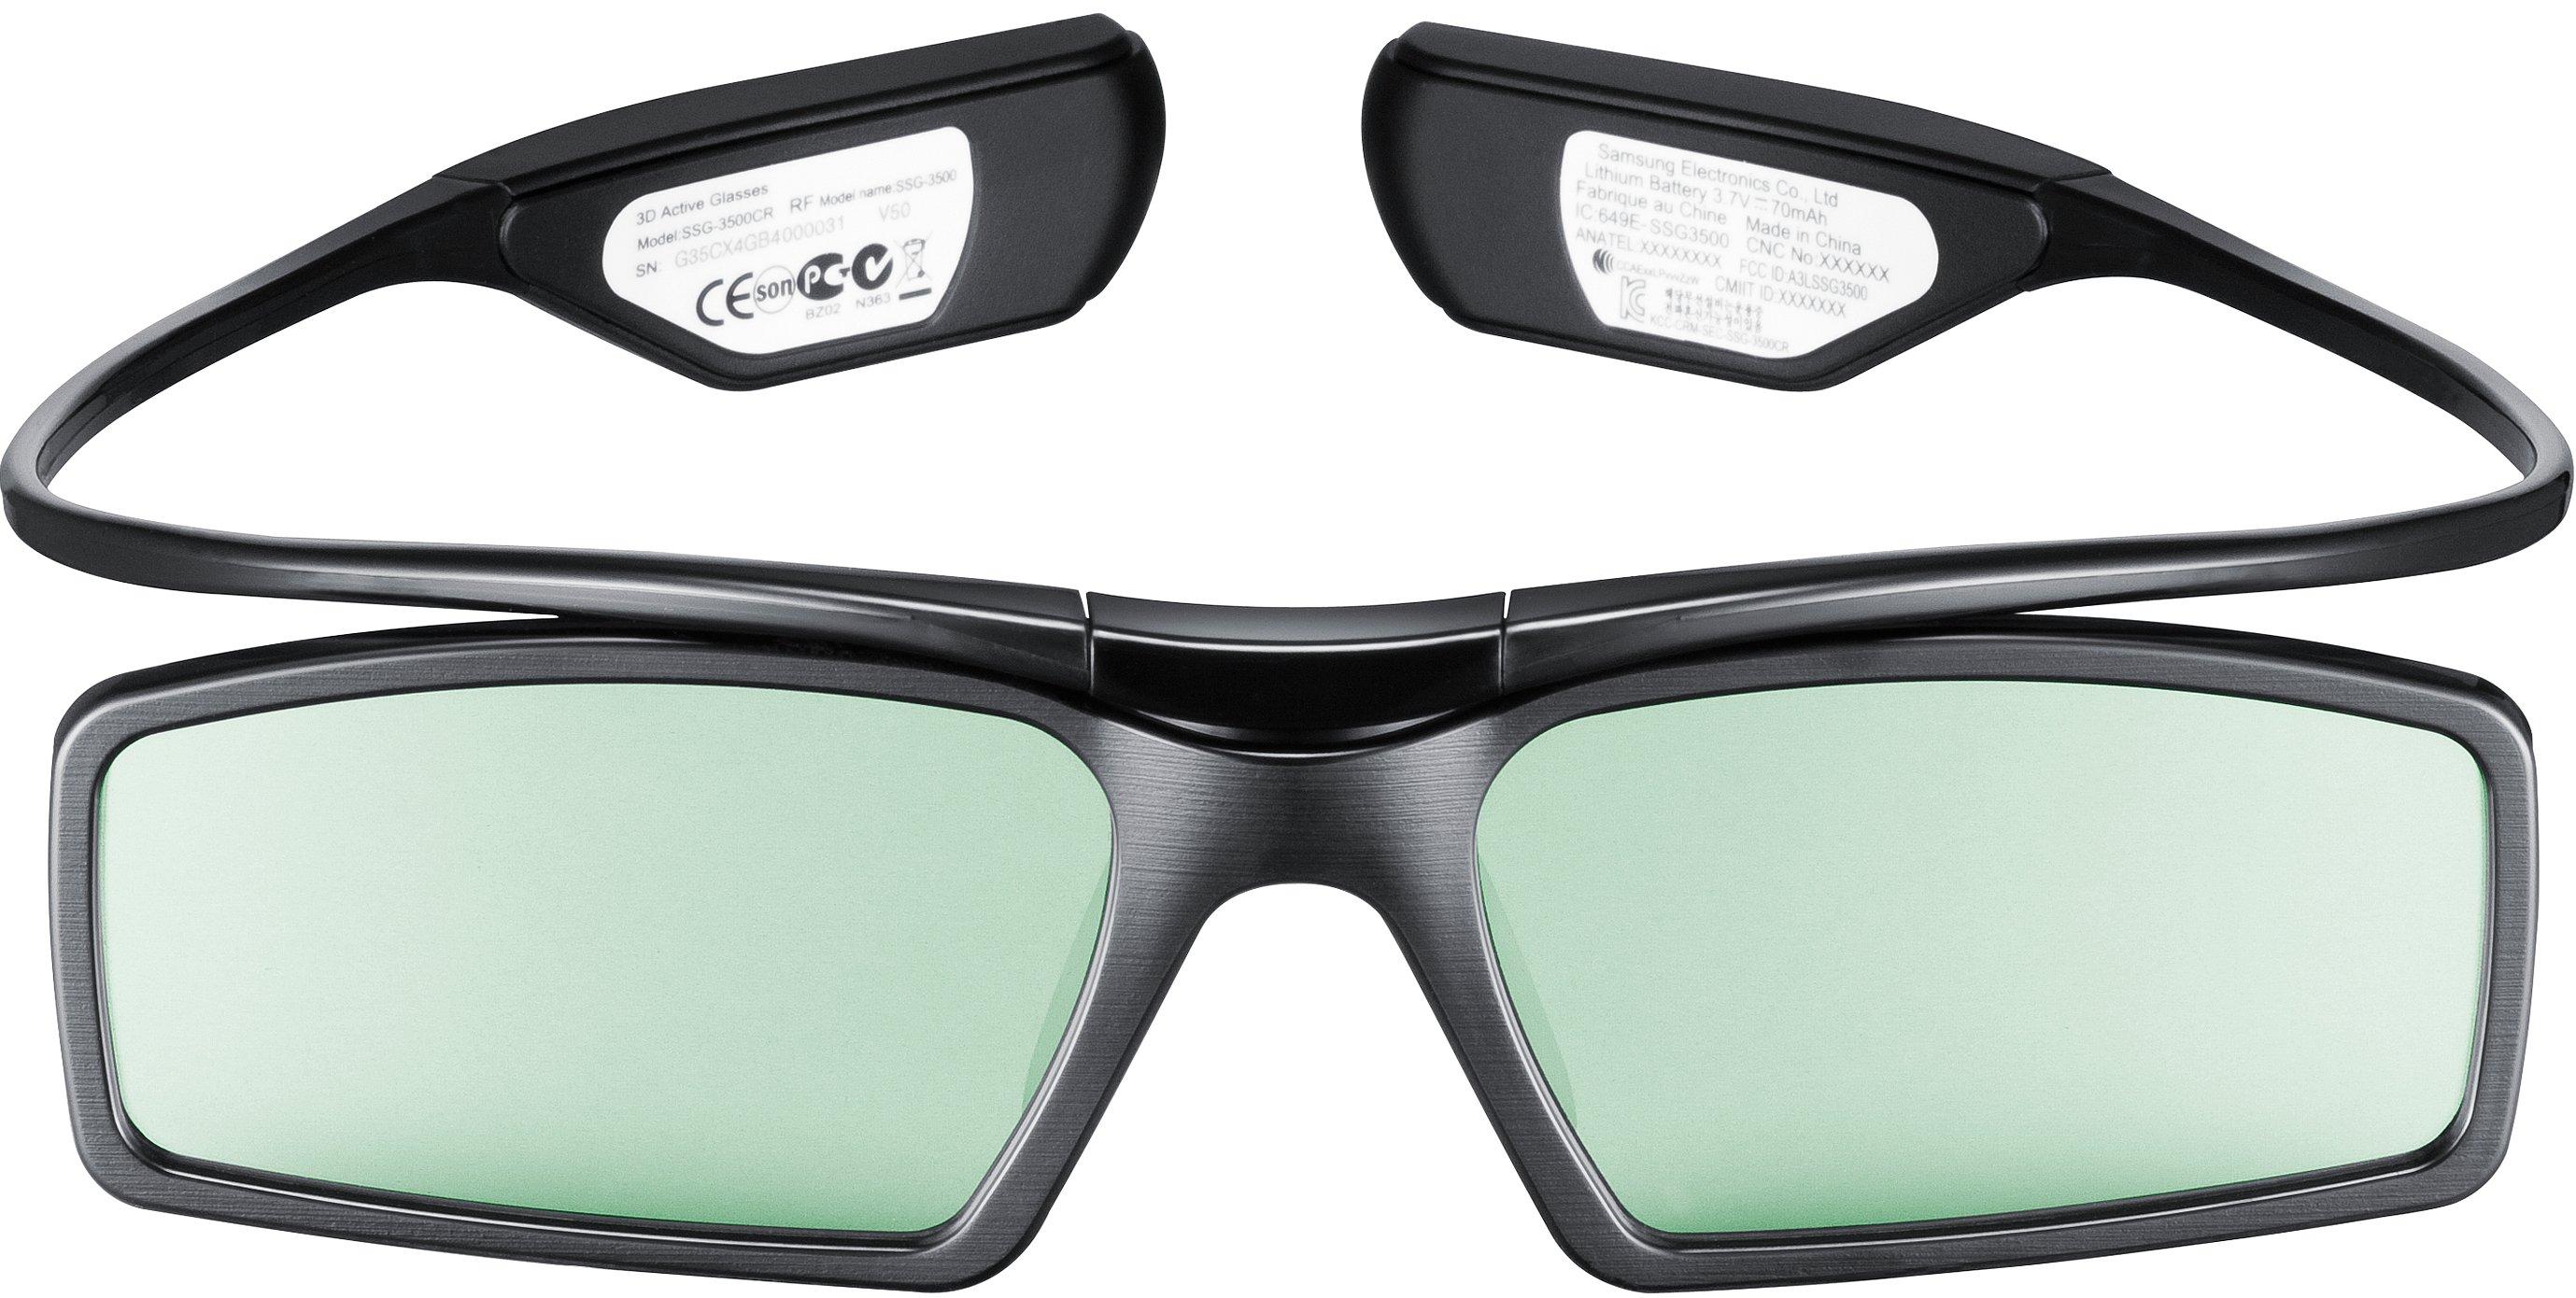 3D очки Samsung Elmarket 437000.000